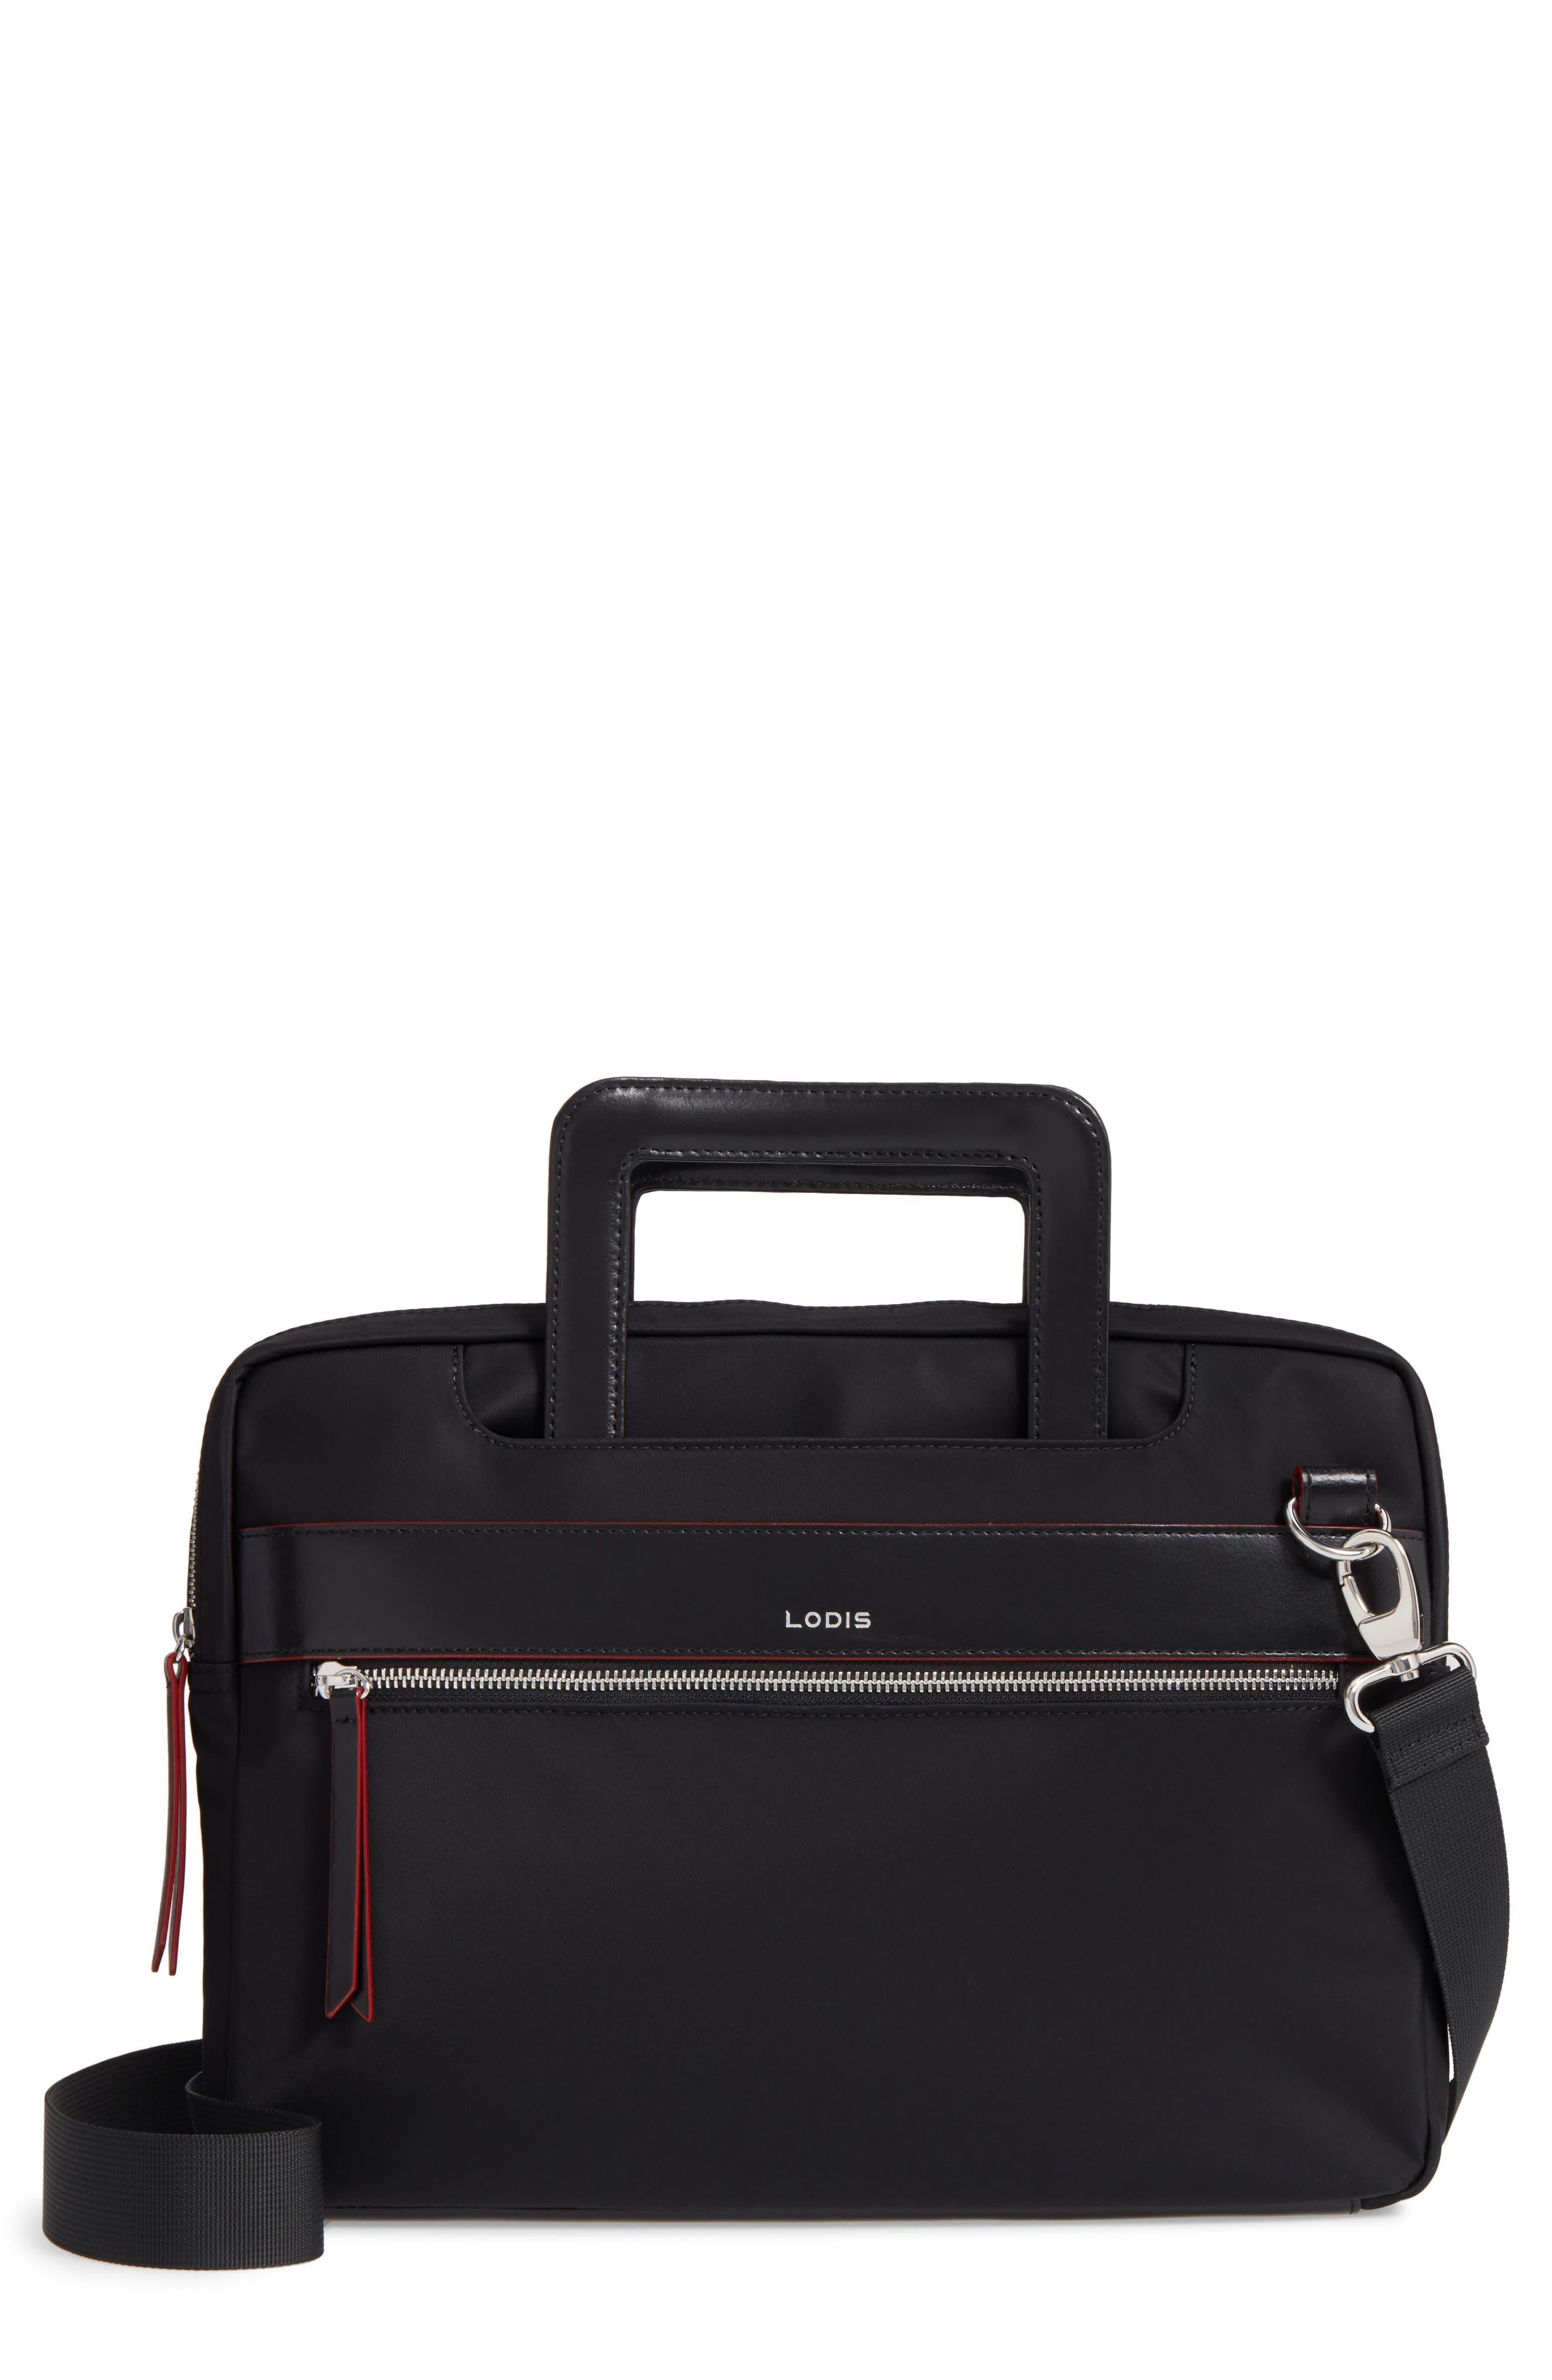 Lodis Cora Laptop Crossbody Bag